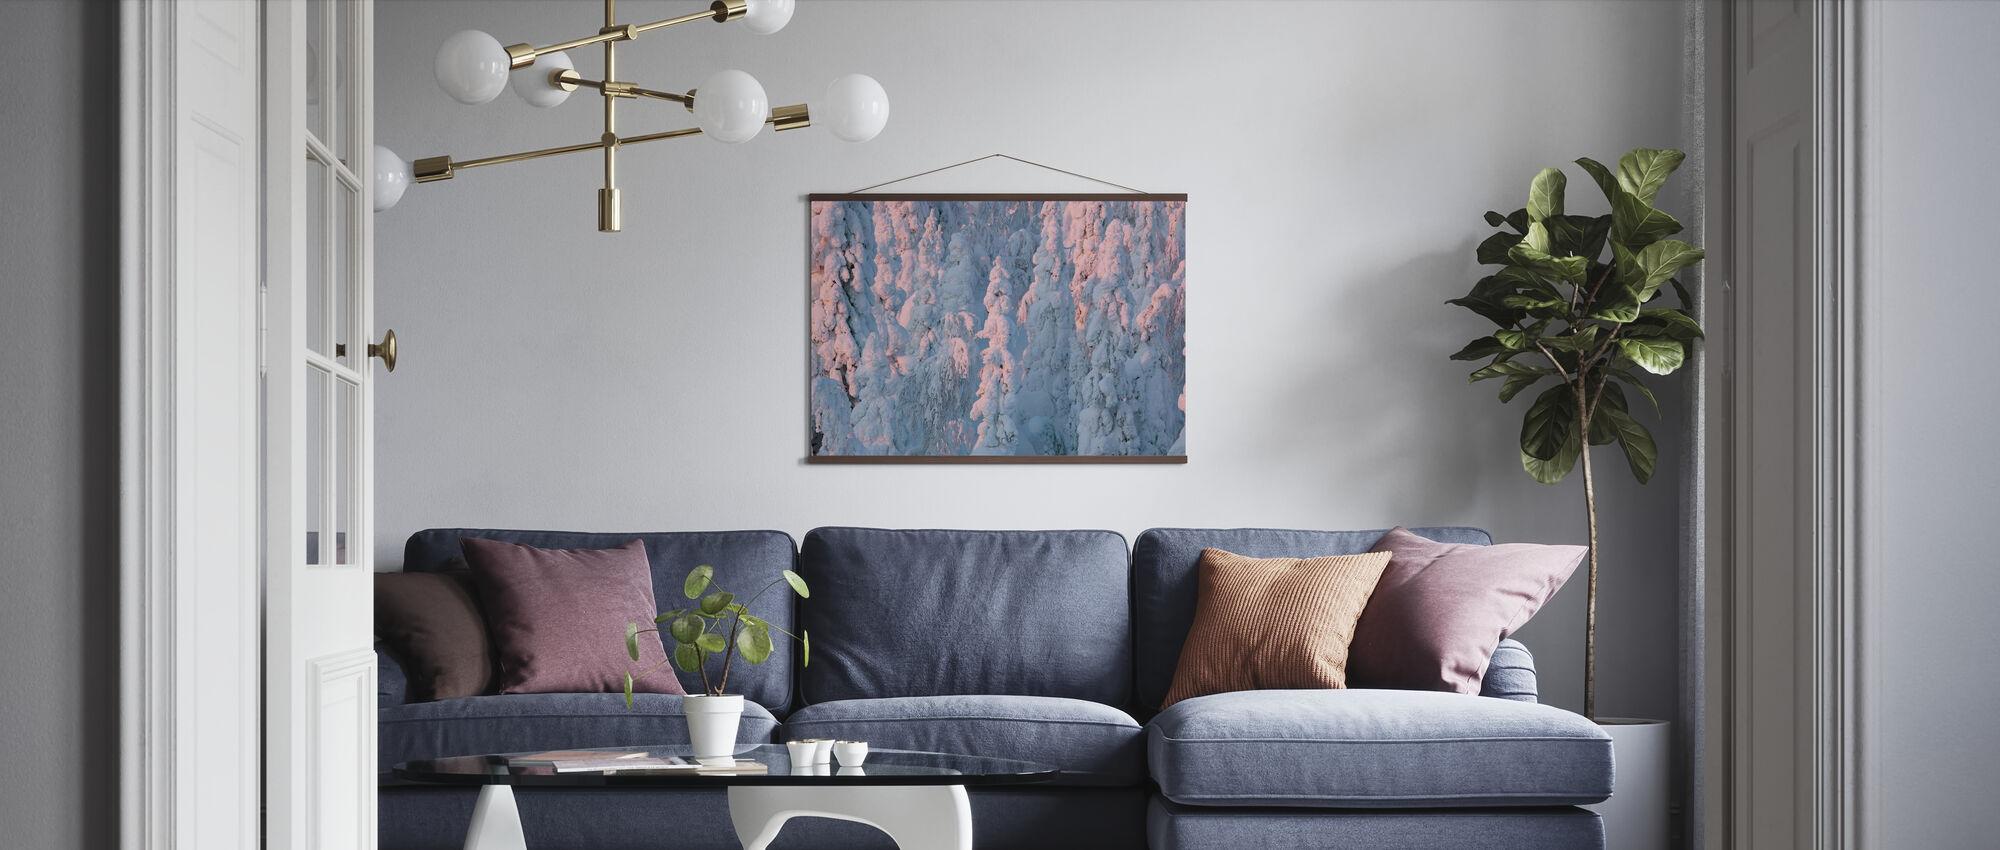 Lapland Winter Landscape - Poster - Living Room